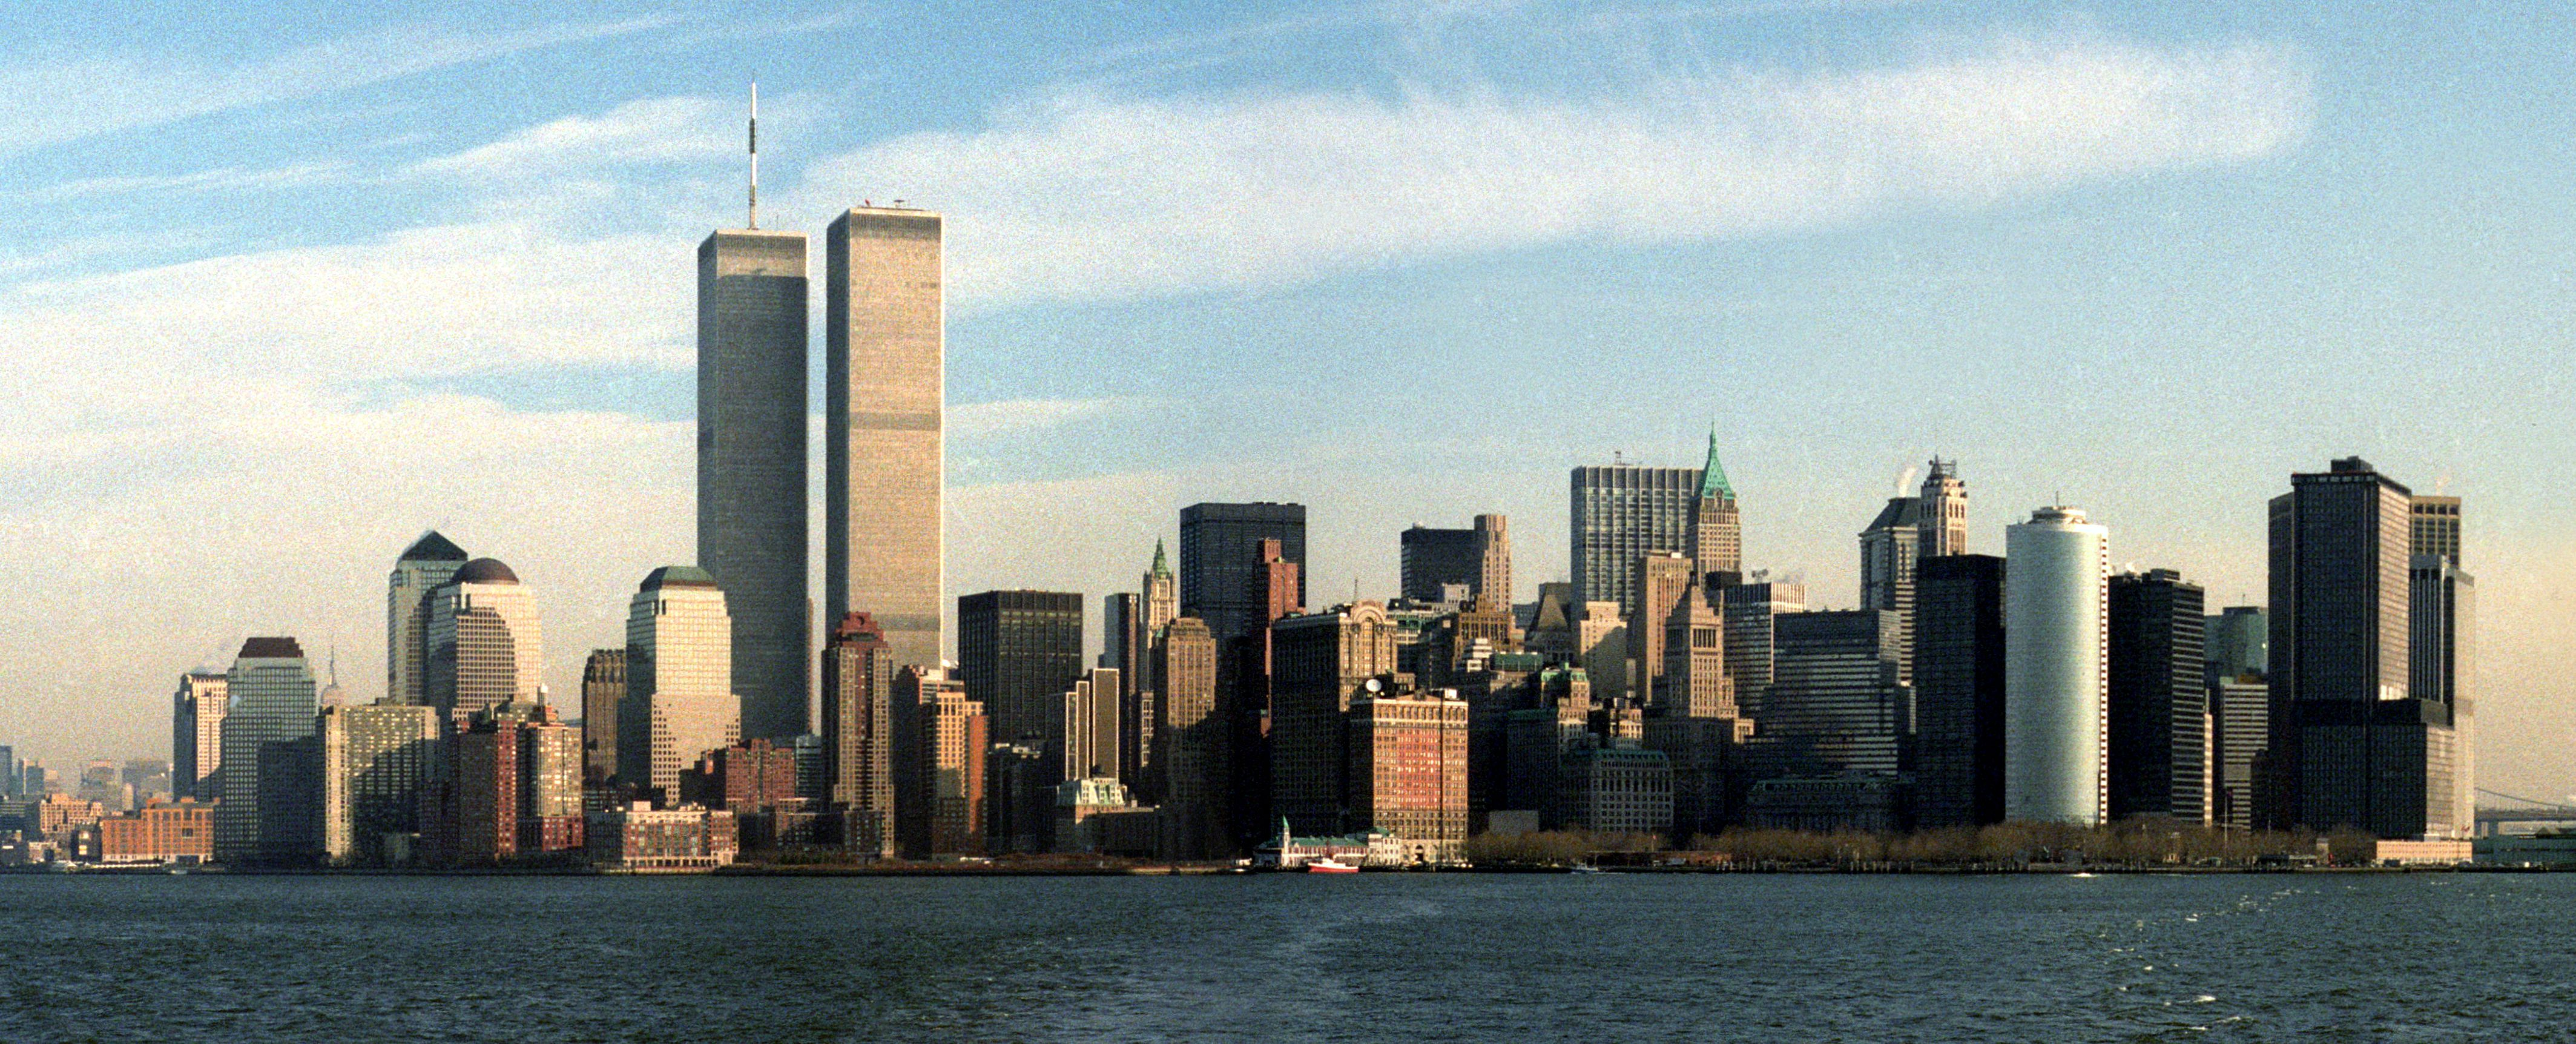 New York Skyline Before 9 11